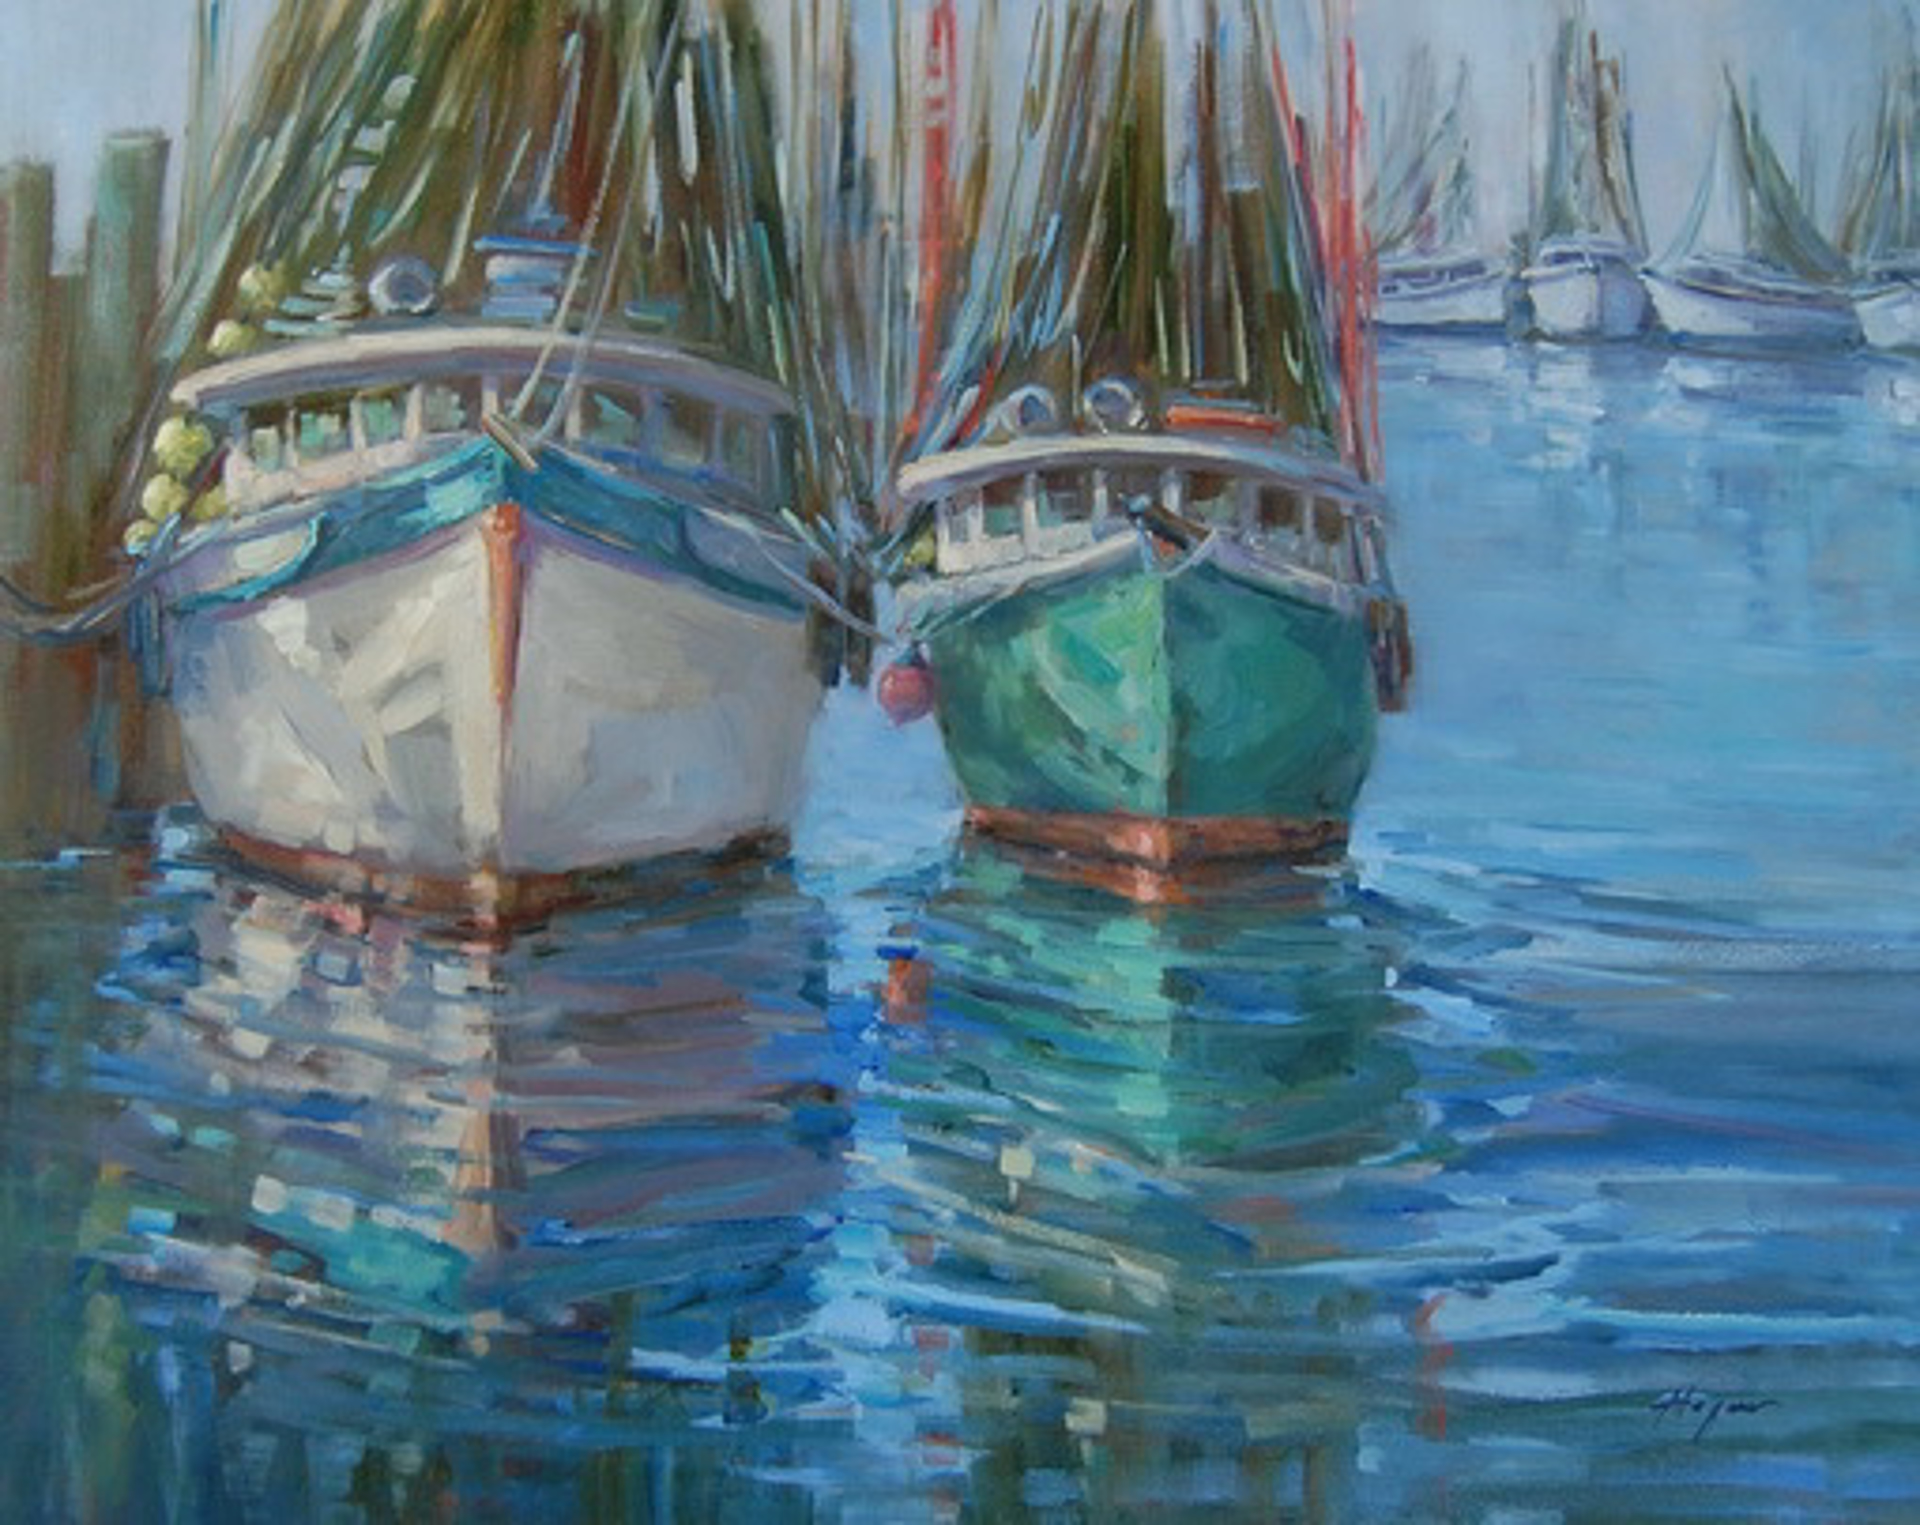 Back at the Docks by Karen Hewitt Hagan